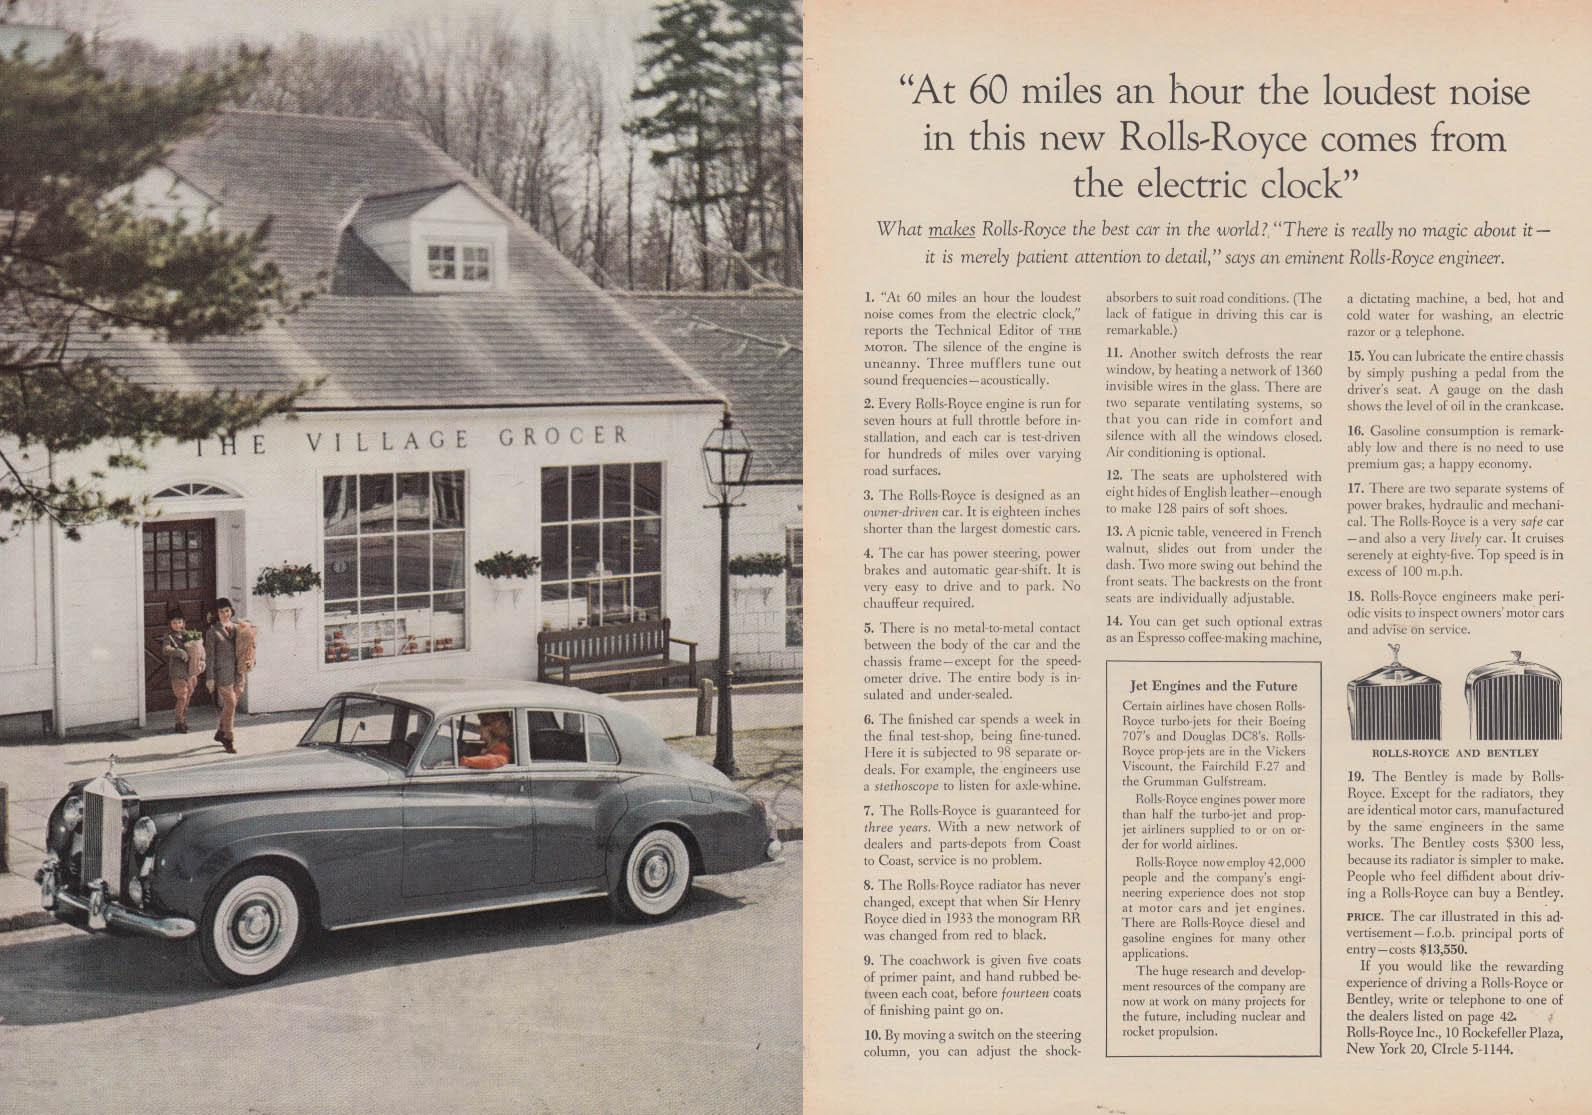 At 60 mph the loudest noise Rolls-Royce / Eero Saarinen Table Knoll ad 1958